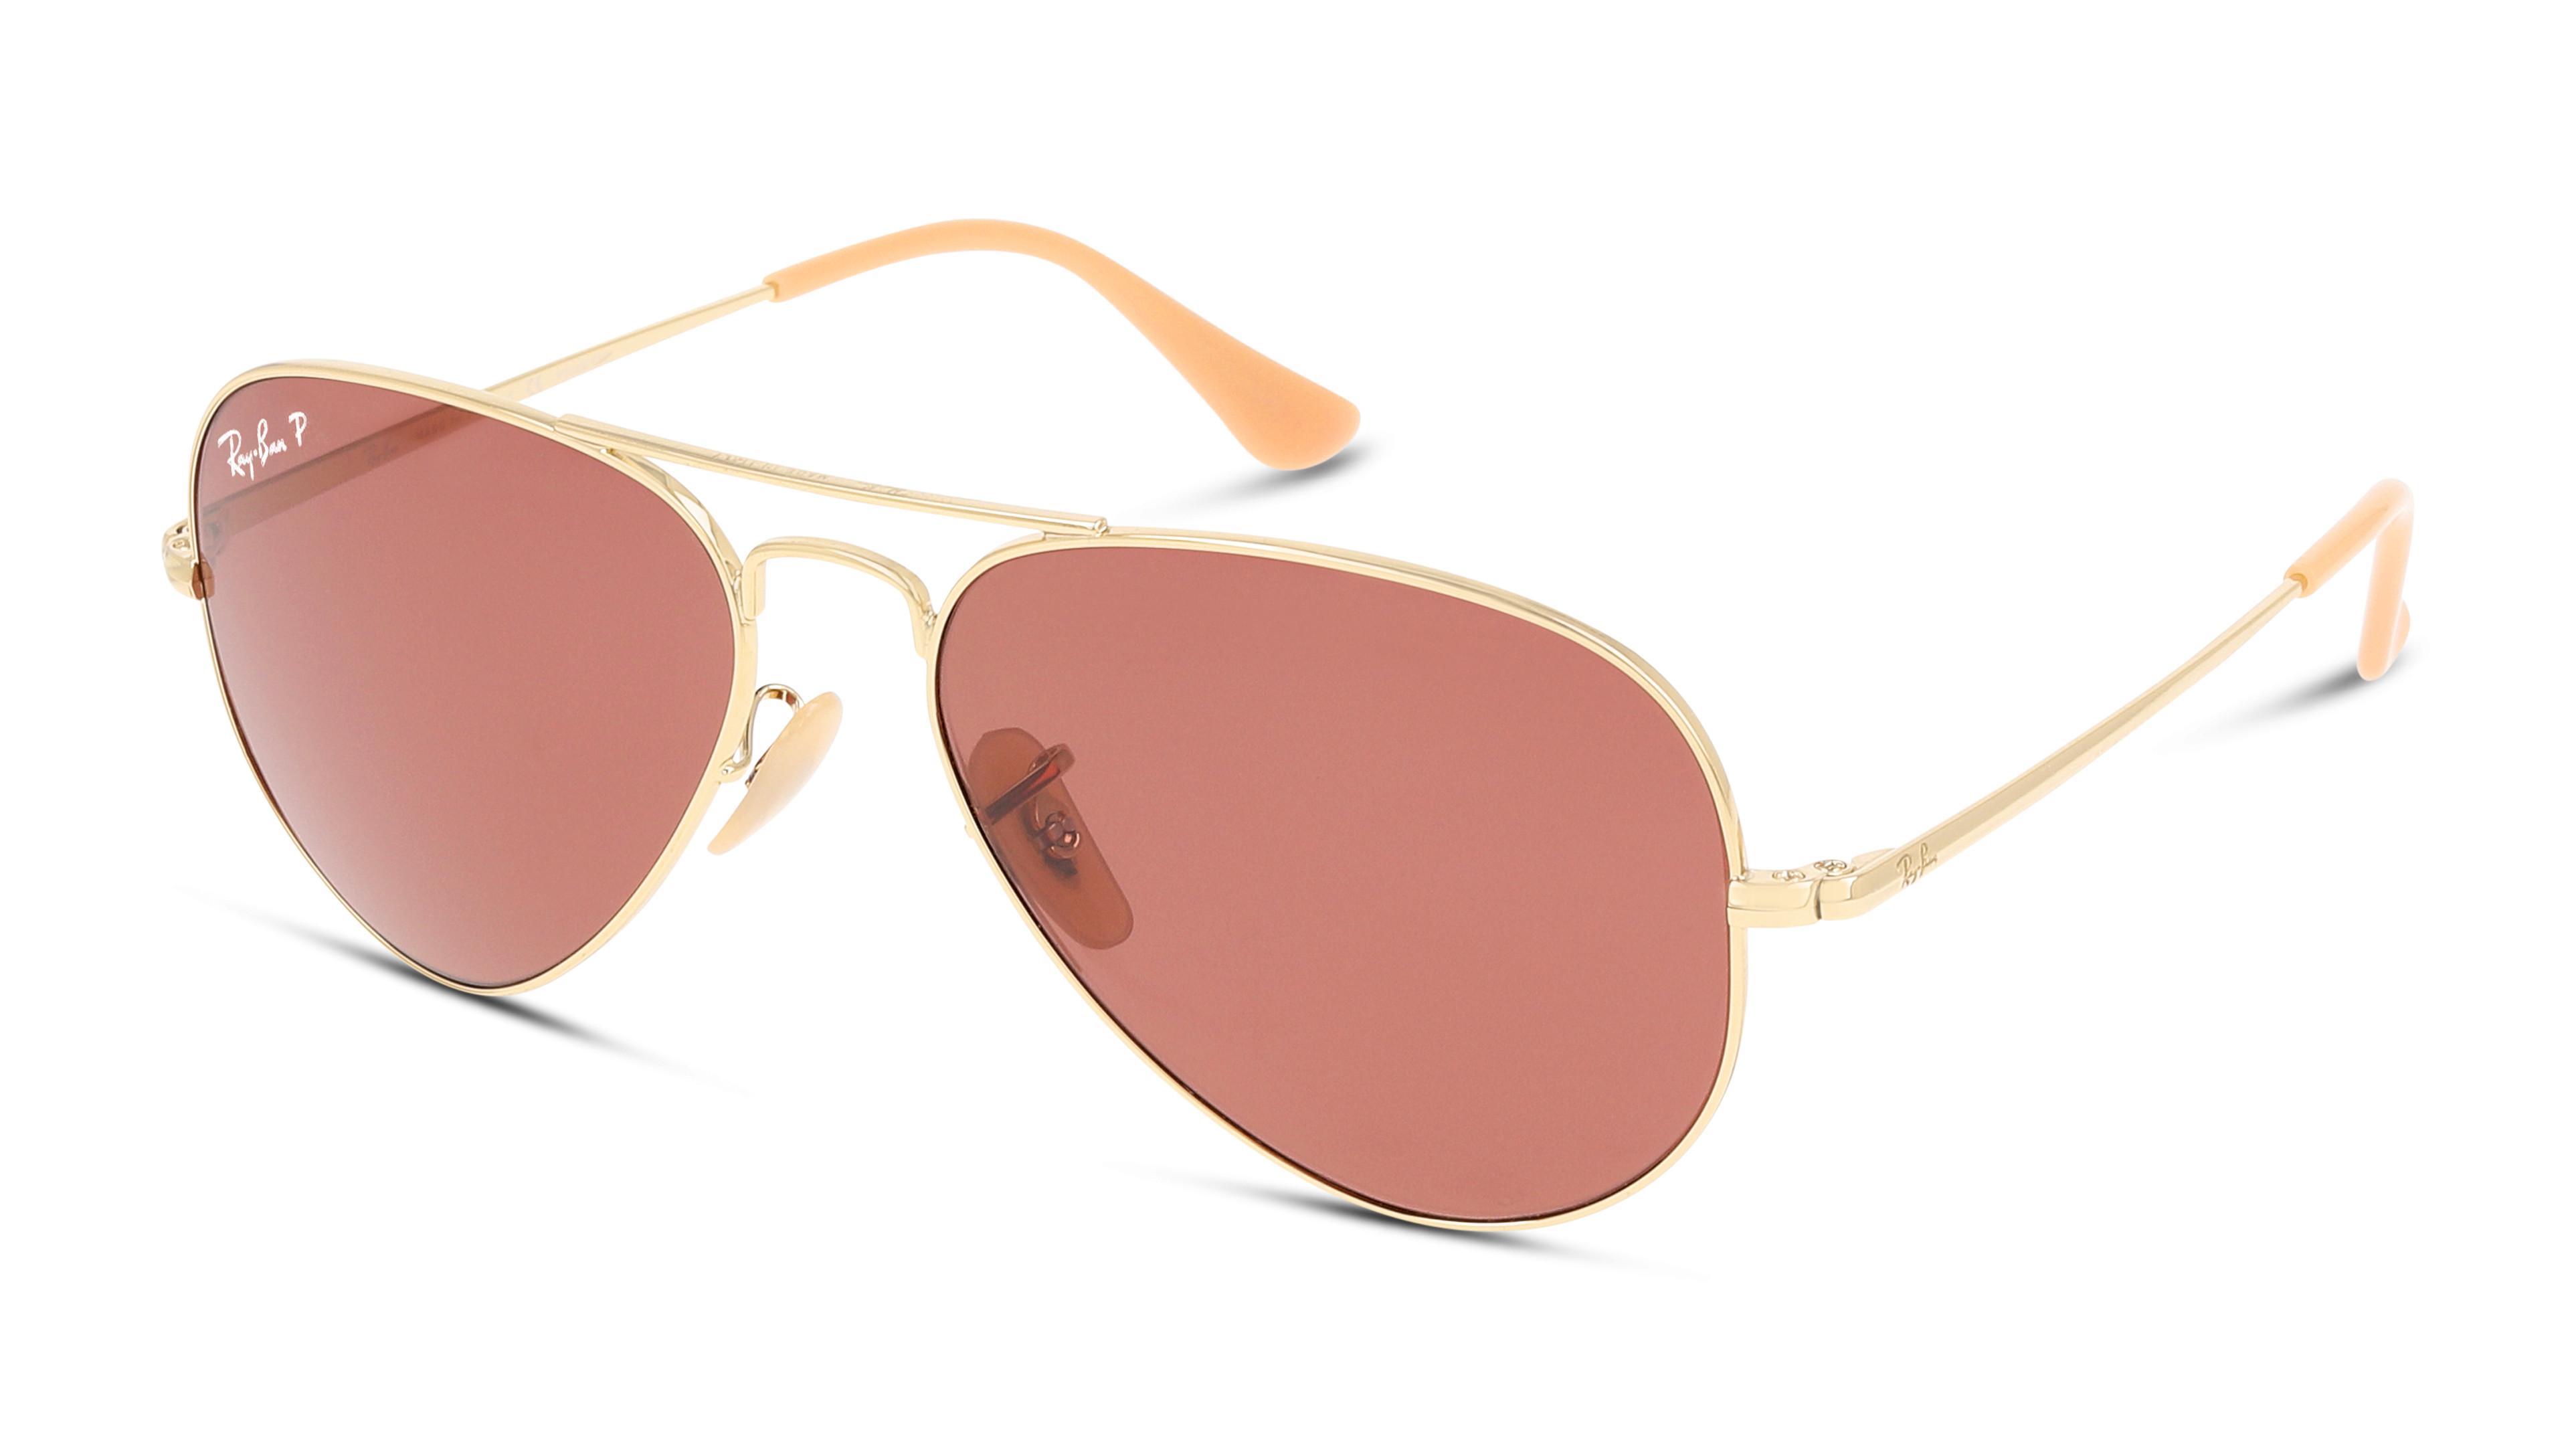 8056597044912-angle-03-ray-ban-0rb3689-eyewear-pair